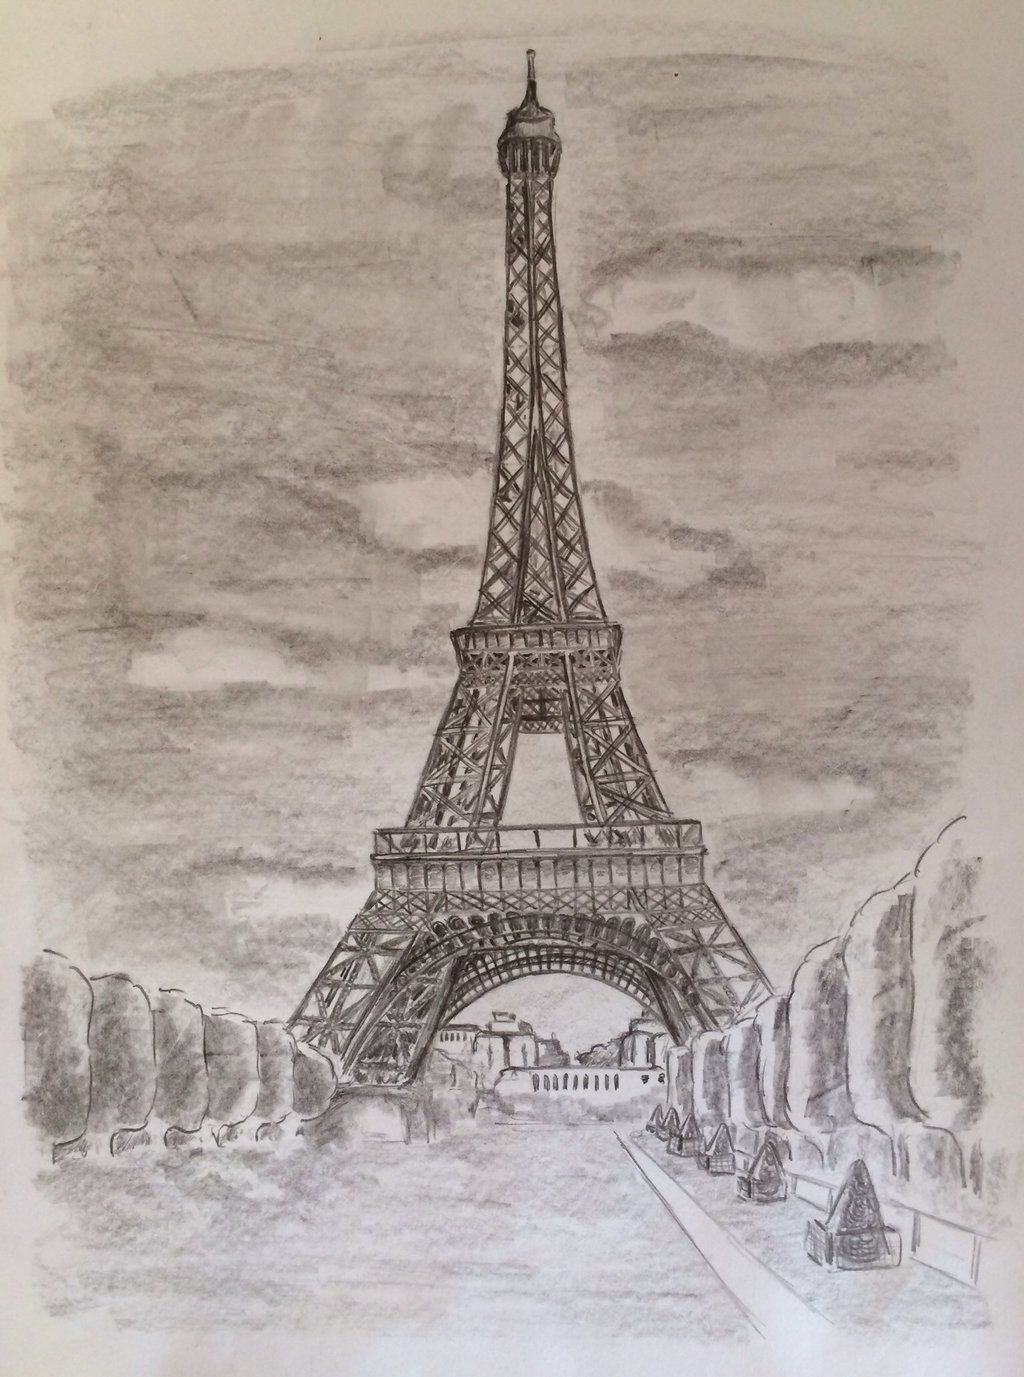 Tour Eiffel Tower Paris France Black White Drawing